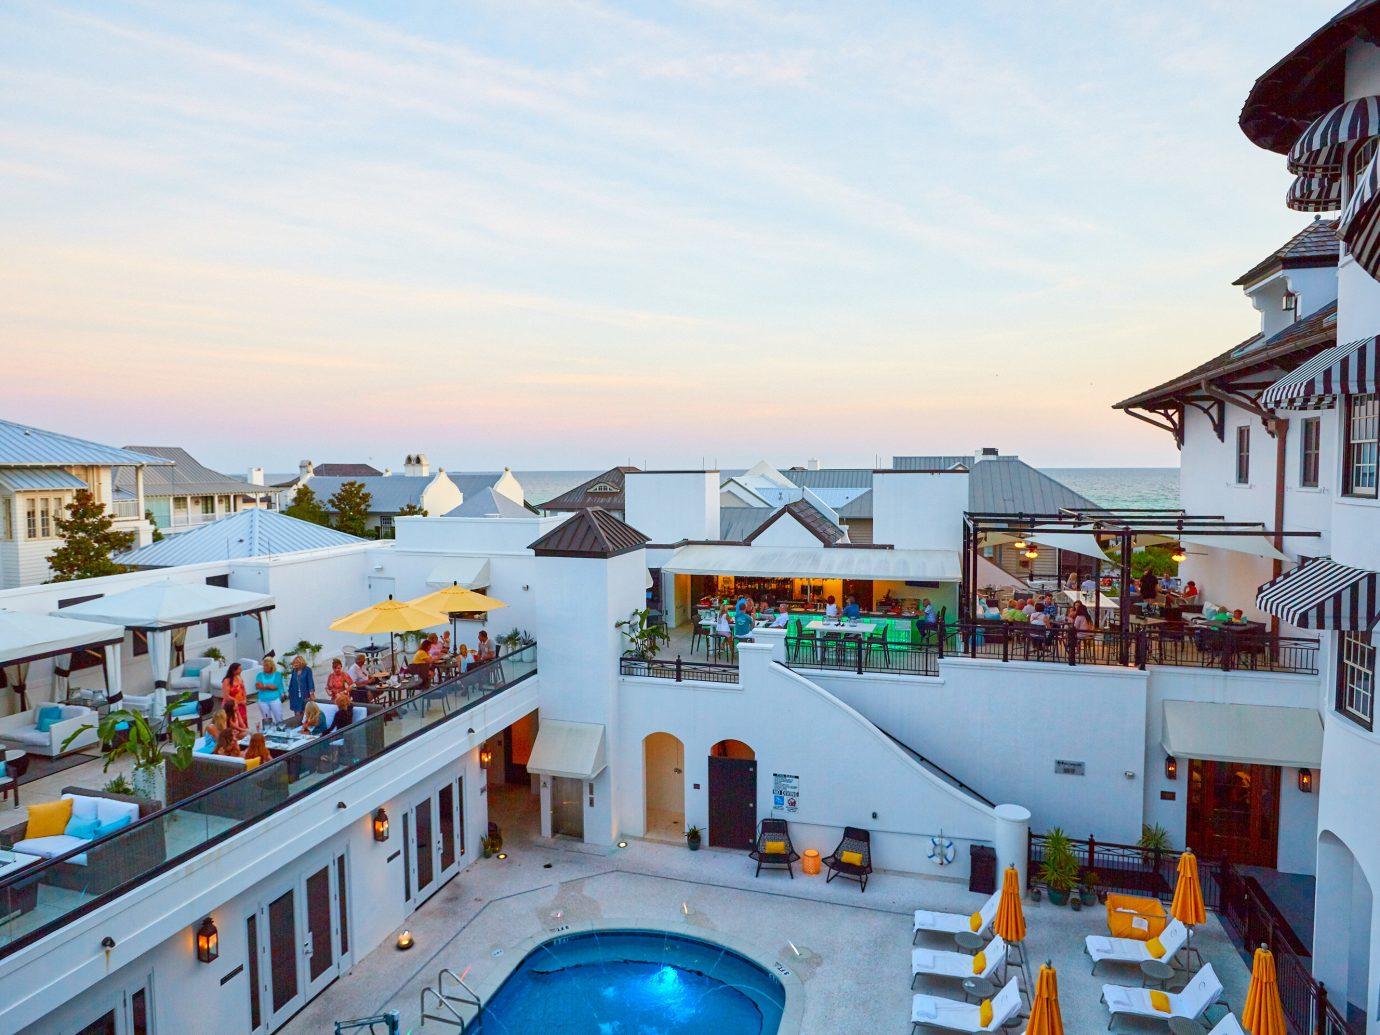 sky Town vacation Beach Sea house Resort tourism caribbean marina Coast vehicle dock travel toy